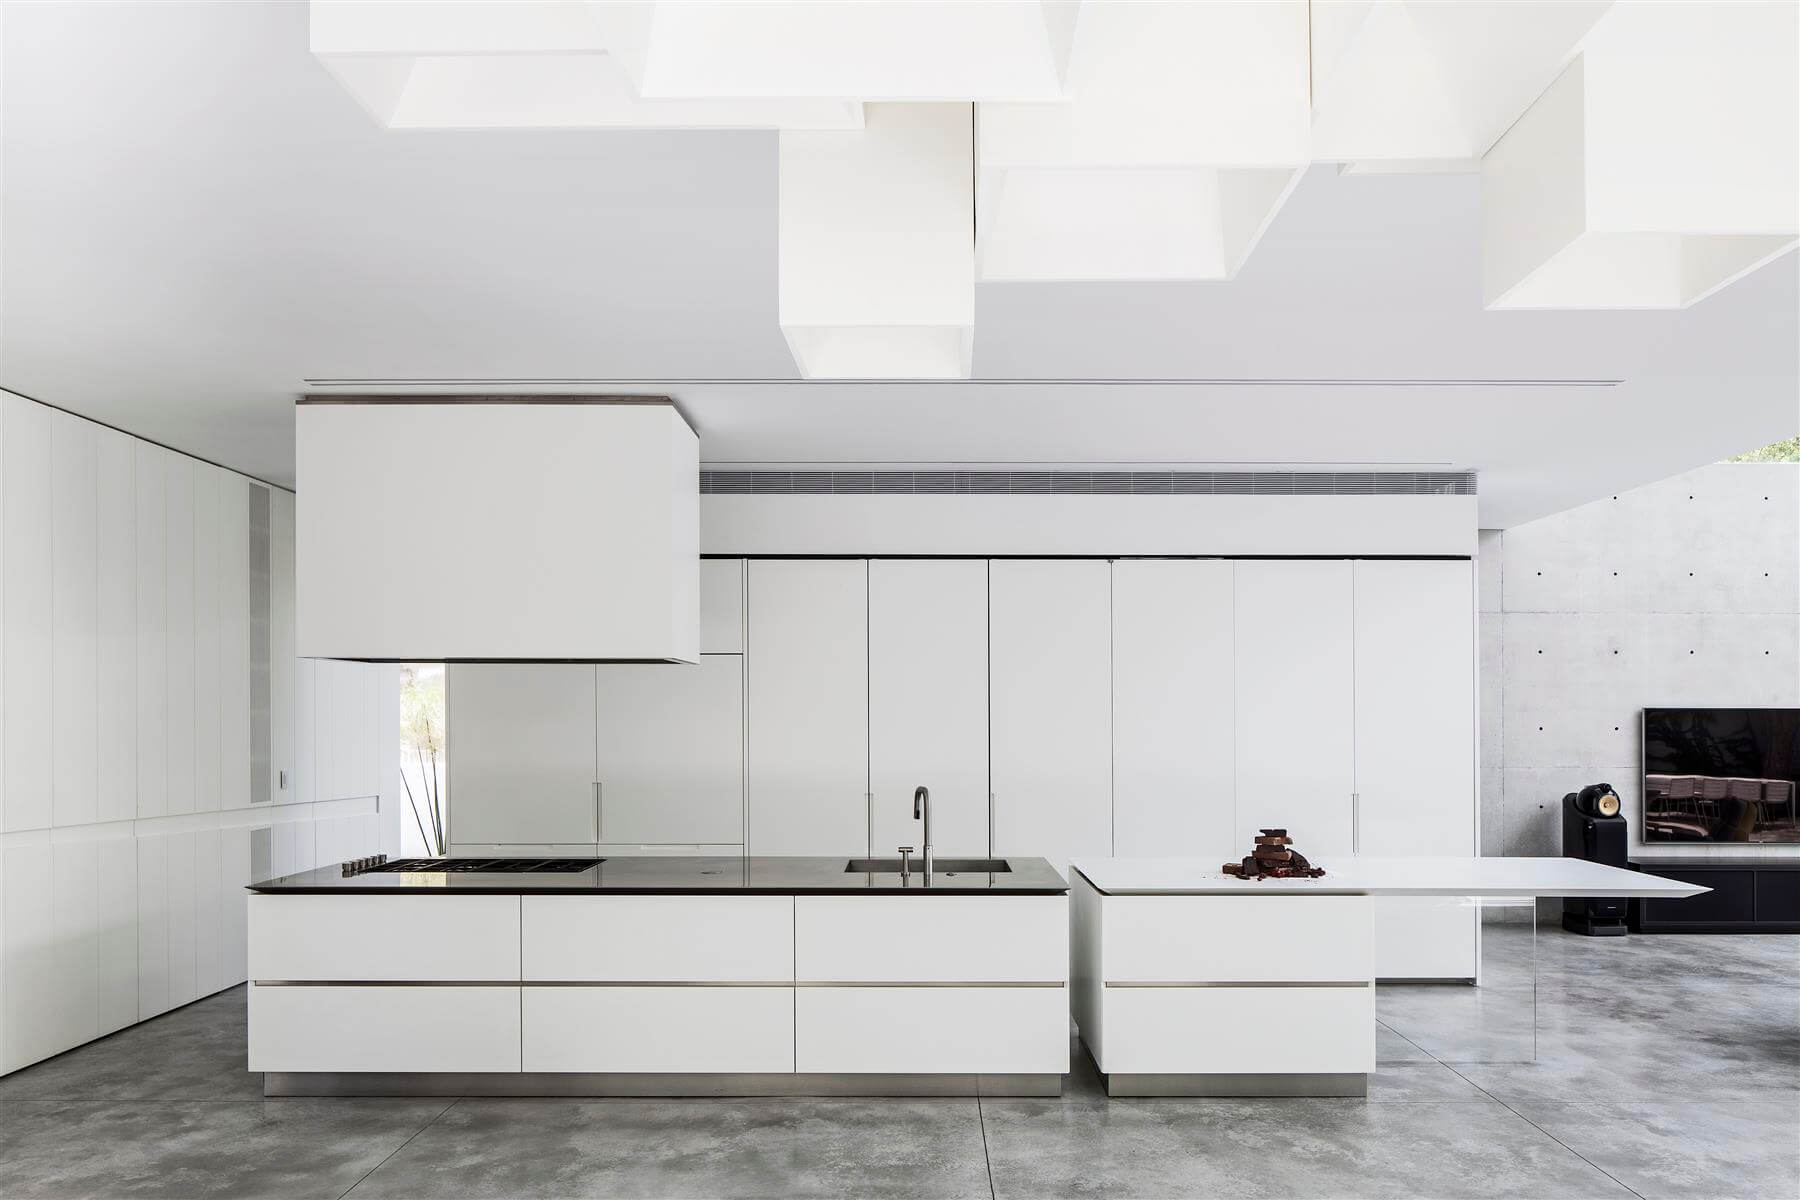 The Concrete Cut House in Ramat Gan by Pitsou Kedem Architects-22